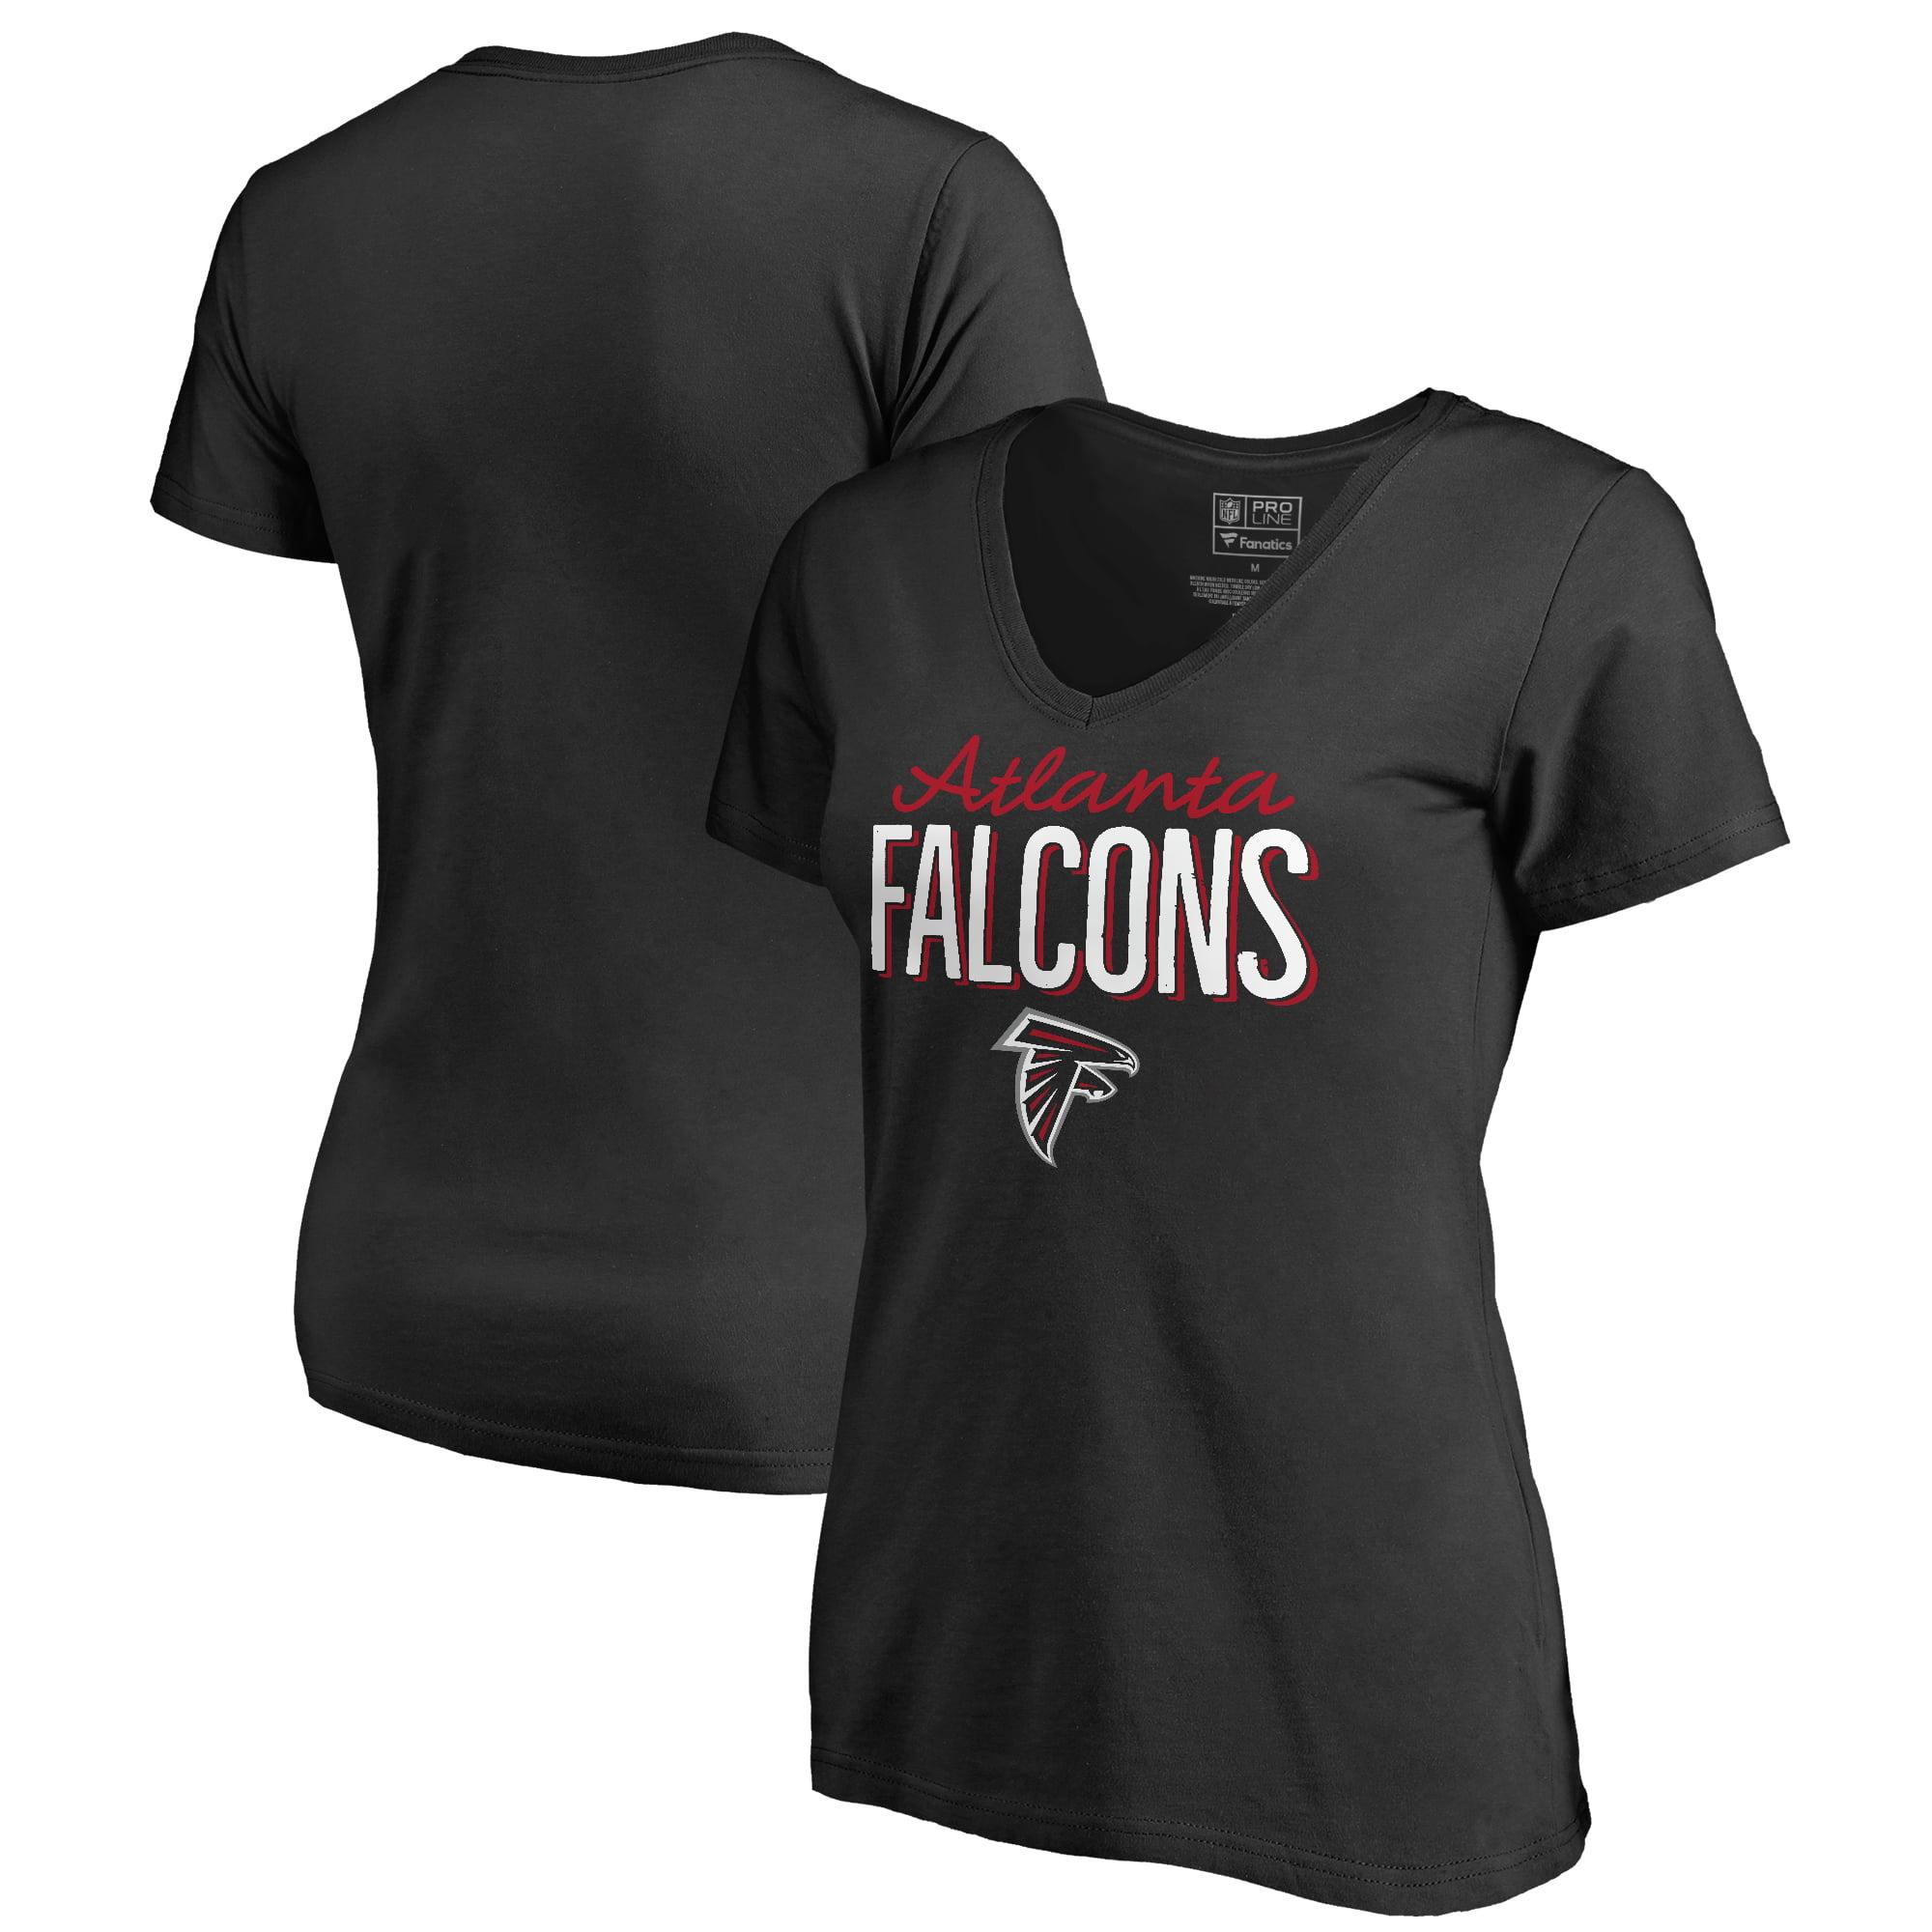 Atlanta Falcons NFL Pro Line by Fanatics Branded Women's Nostalgia T-Shirt - Black